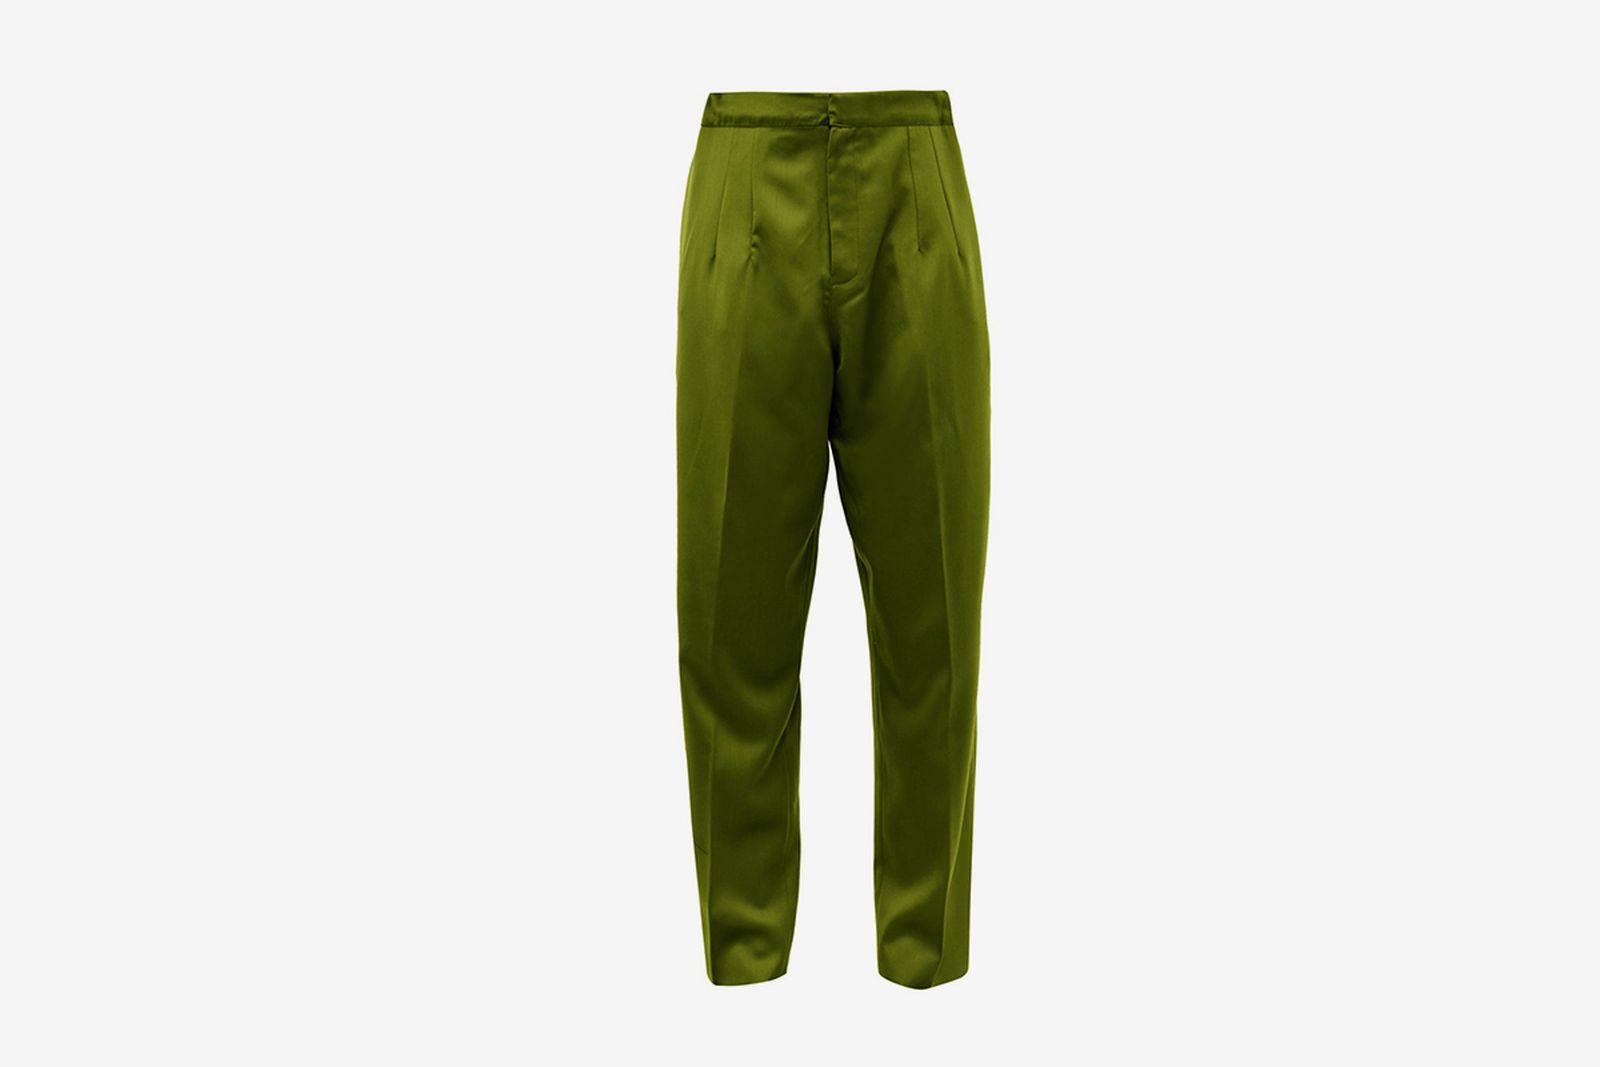 formal trousers main Acne Studios Bianca Saunders Oliver Spencer